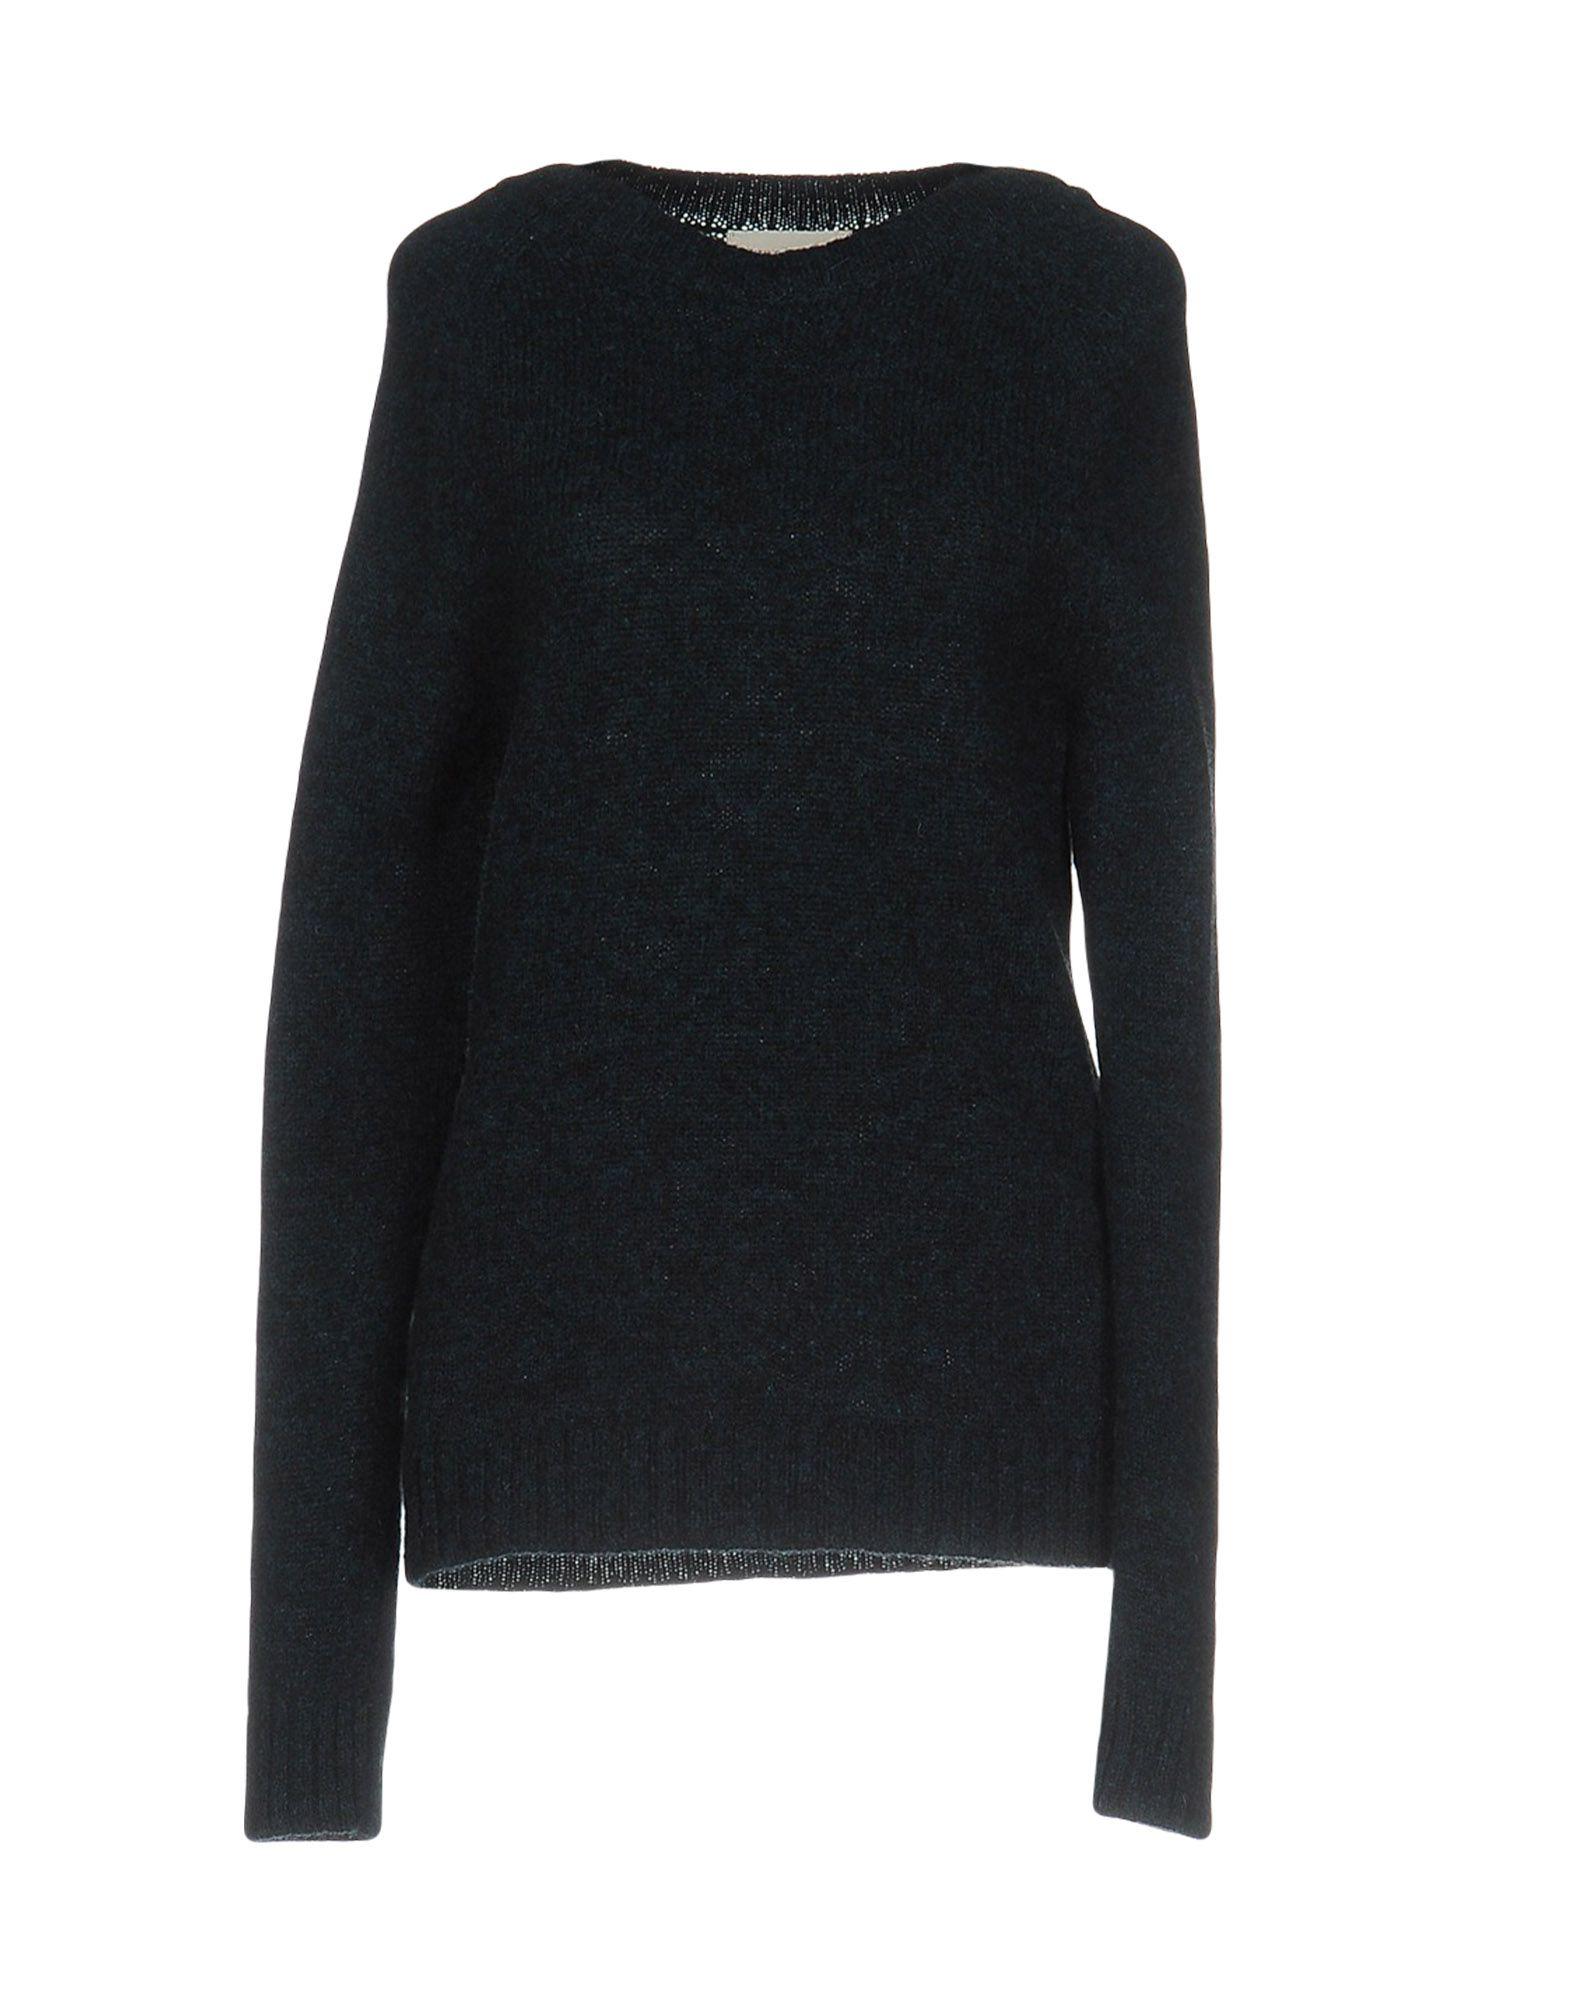 ФОТО faith connexion свитер